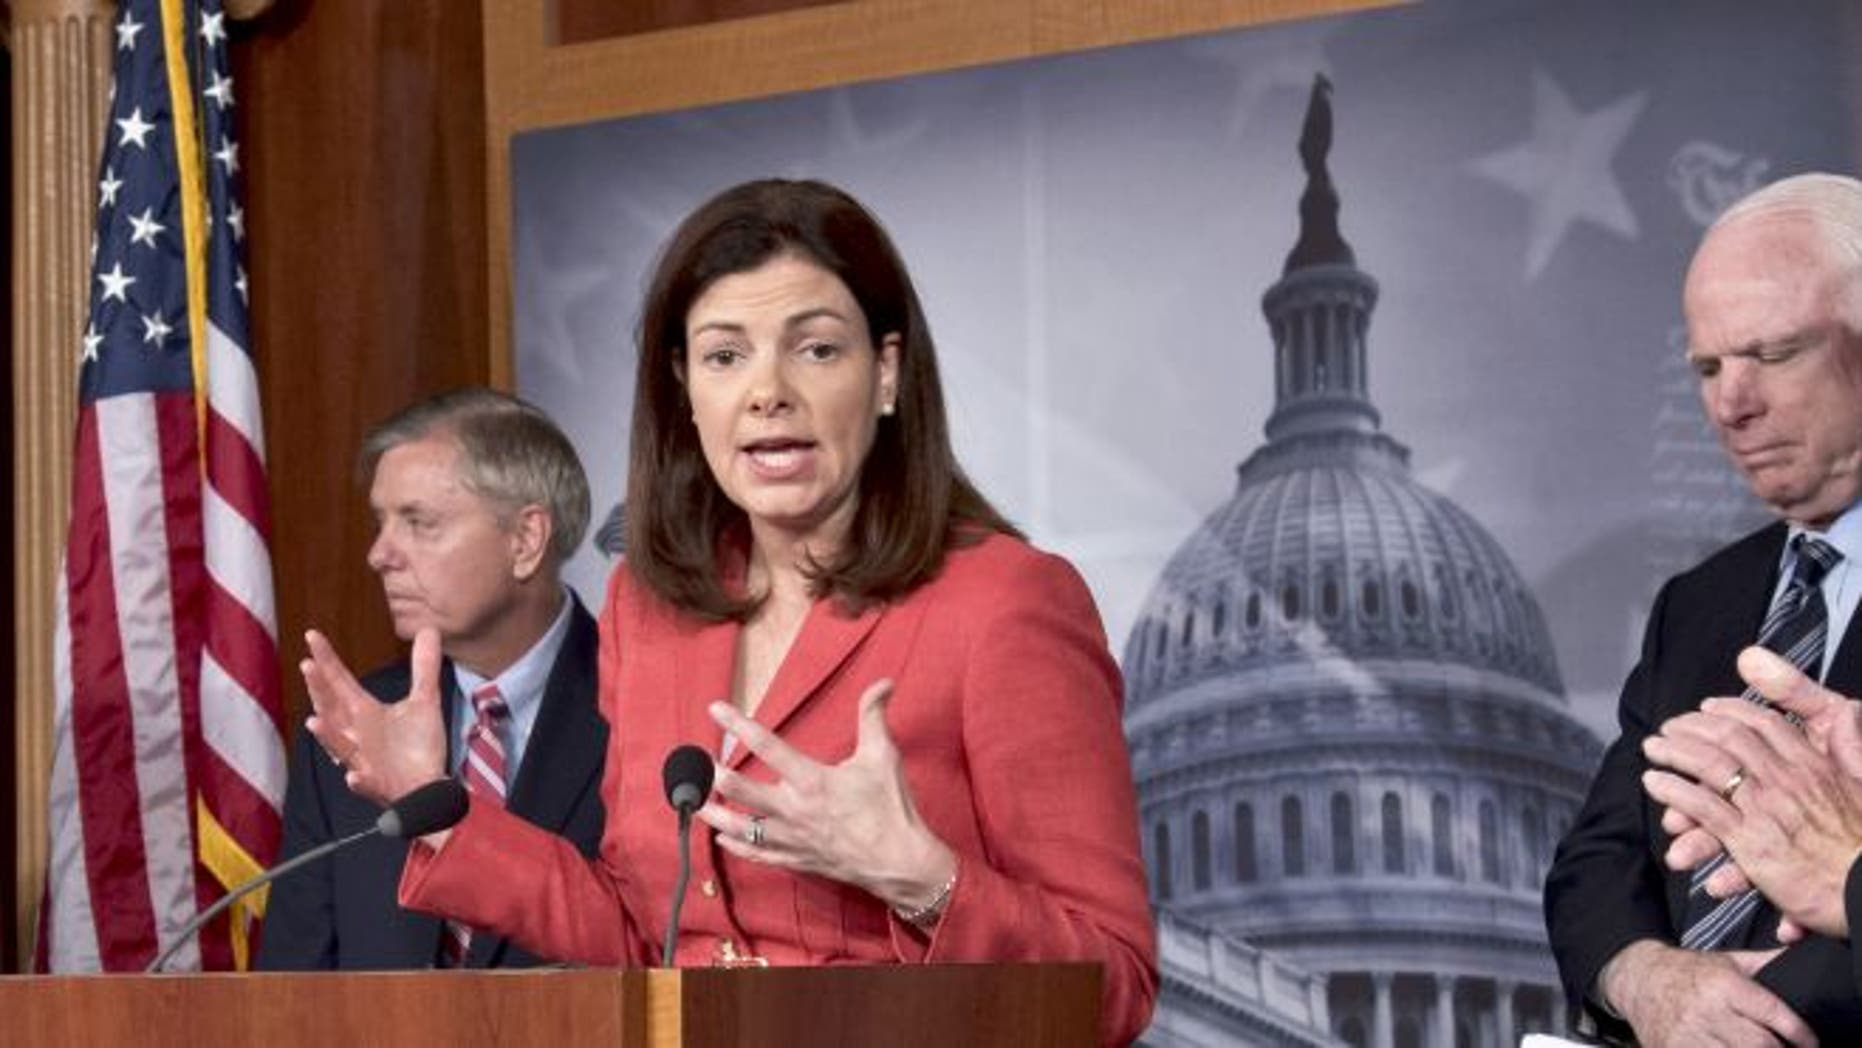 FILE: From right to left, Sen. John McCain, R-Ariz., Sen. Kelly Ayotte, R-N.H., and Sen. Lindsey Graham, R-S.C.